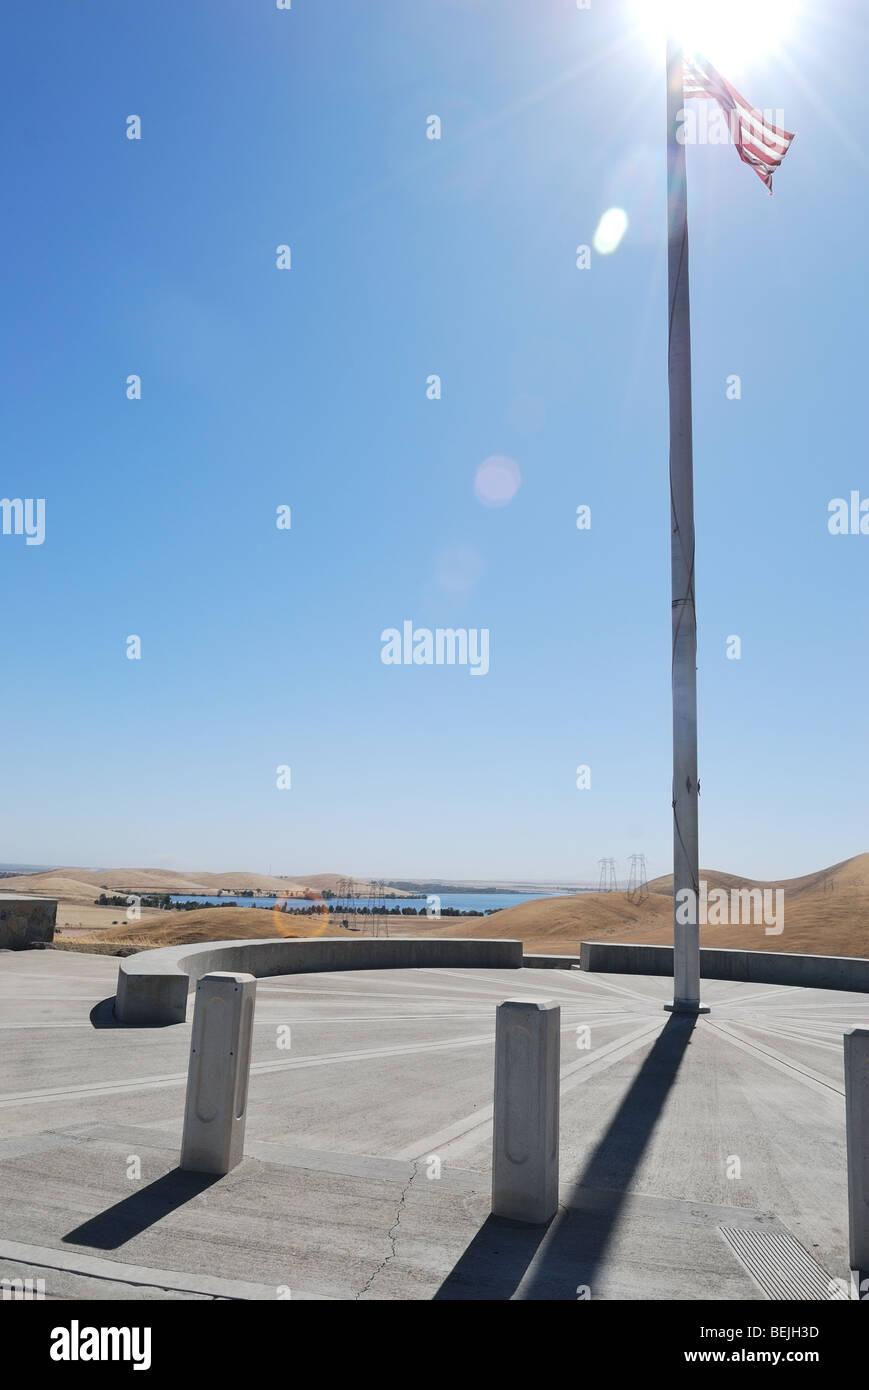 Flagpole at the San Joaquin National Cemetery, Santa Nella, California - Stock Image